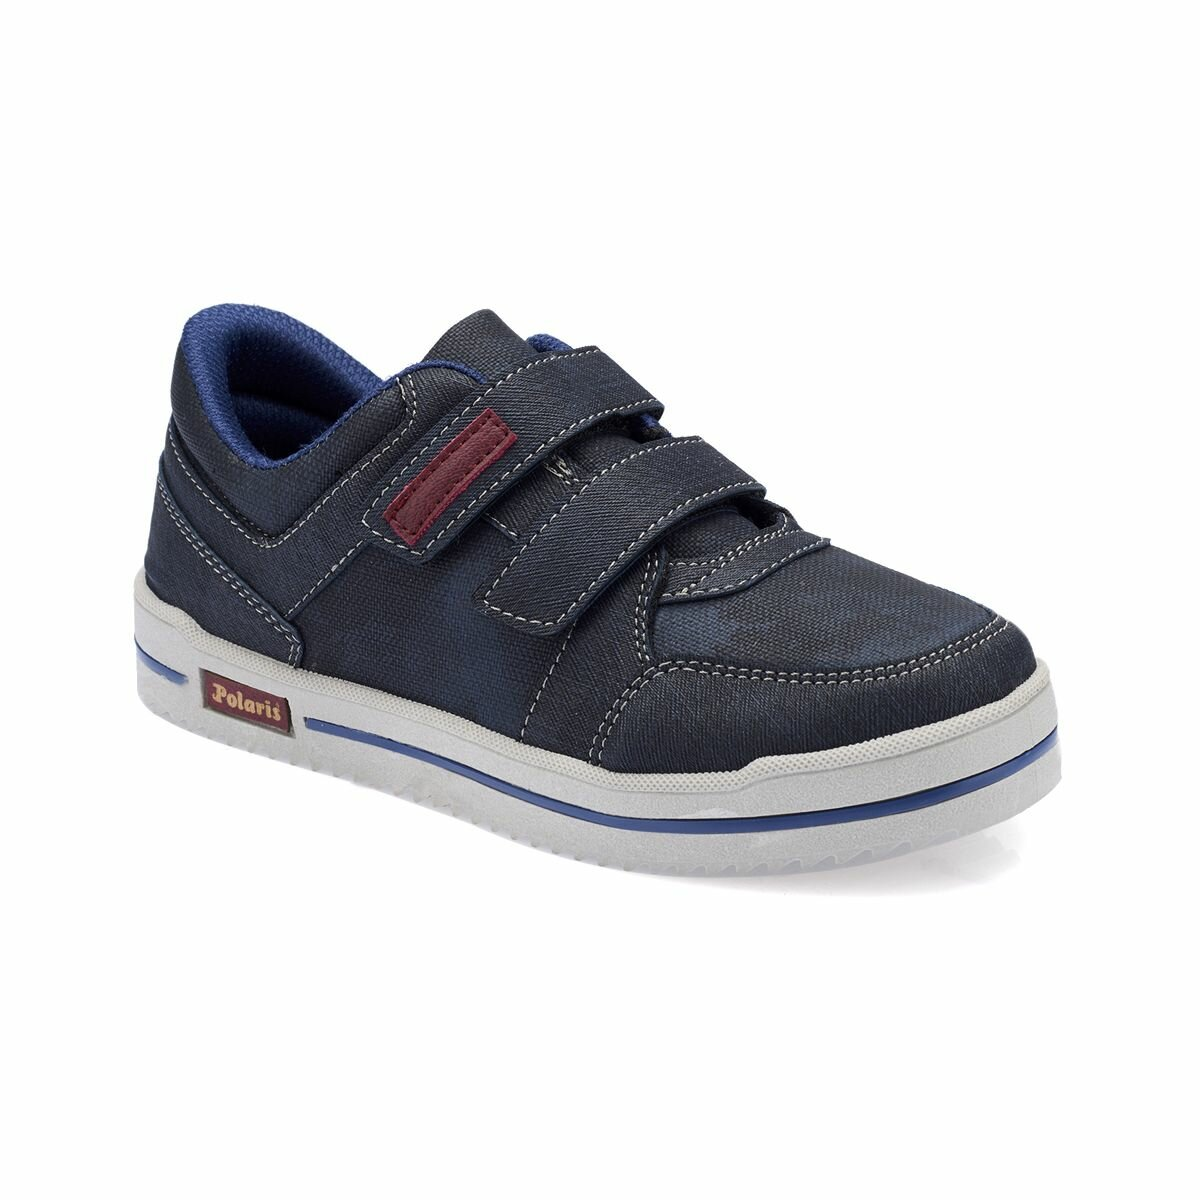 FLO 82.510889.F Navy Blue Male Child Shoes Polaris